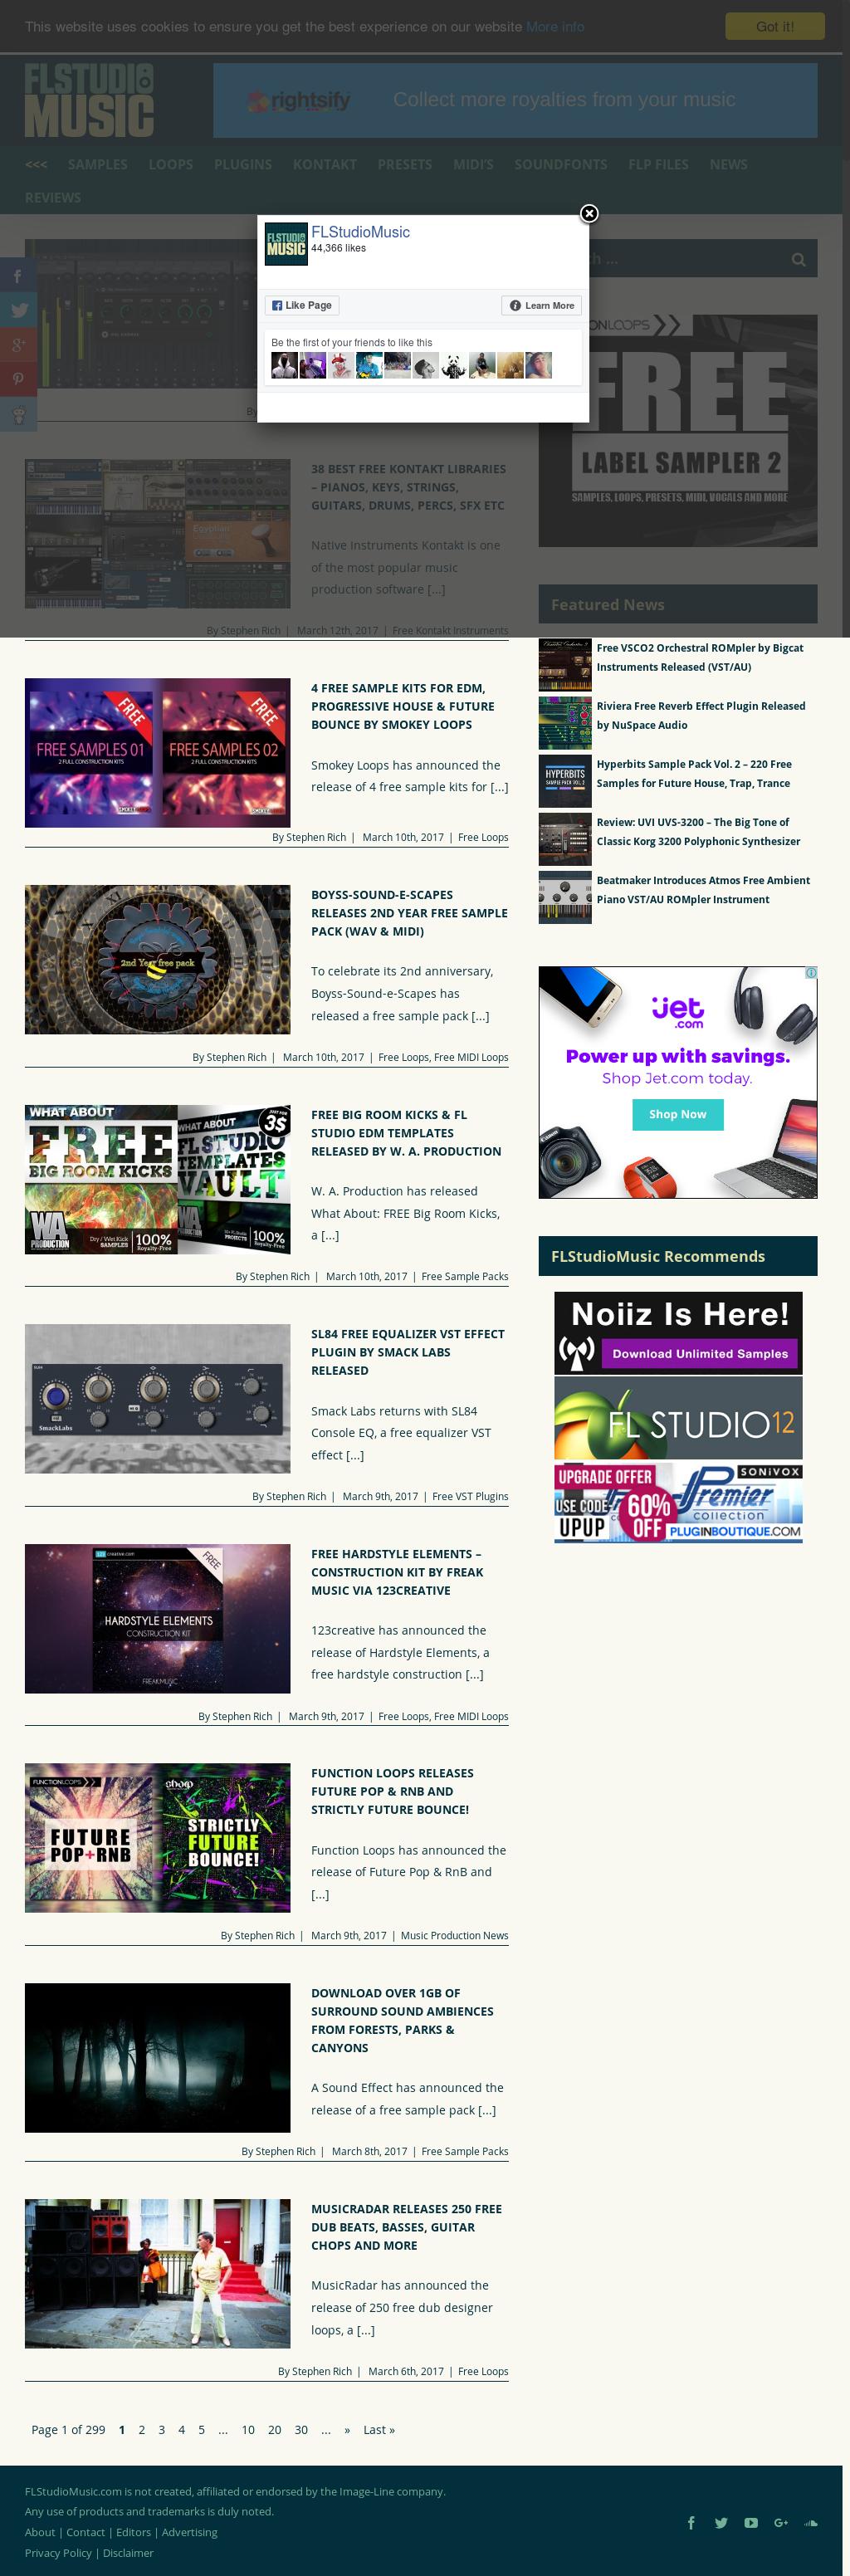 Owler Reports - Flstudiomania Blog Image-Line Releases 151